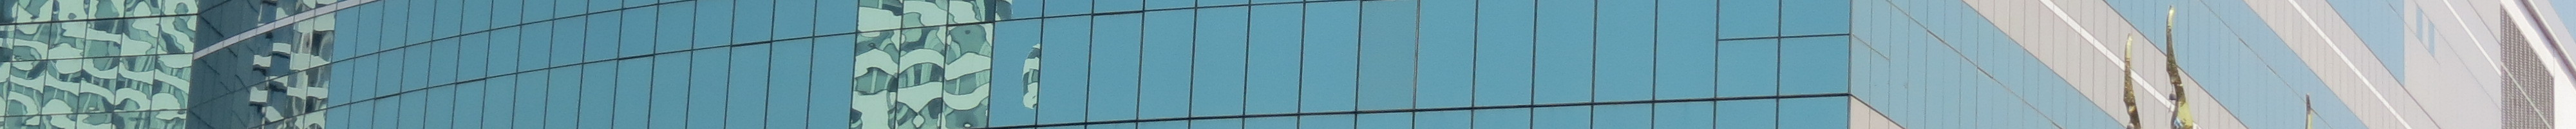 Reflections on the CAT Telecom Tower, Bangkok